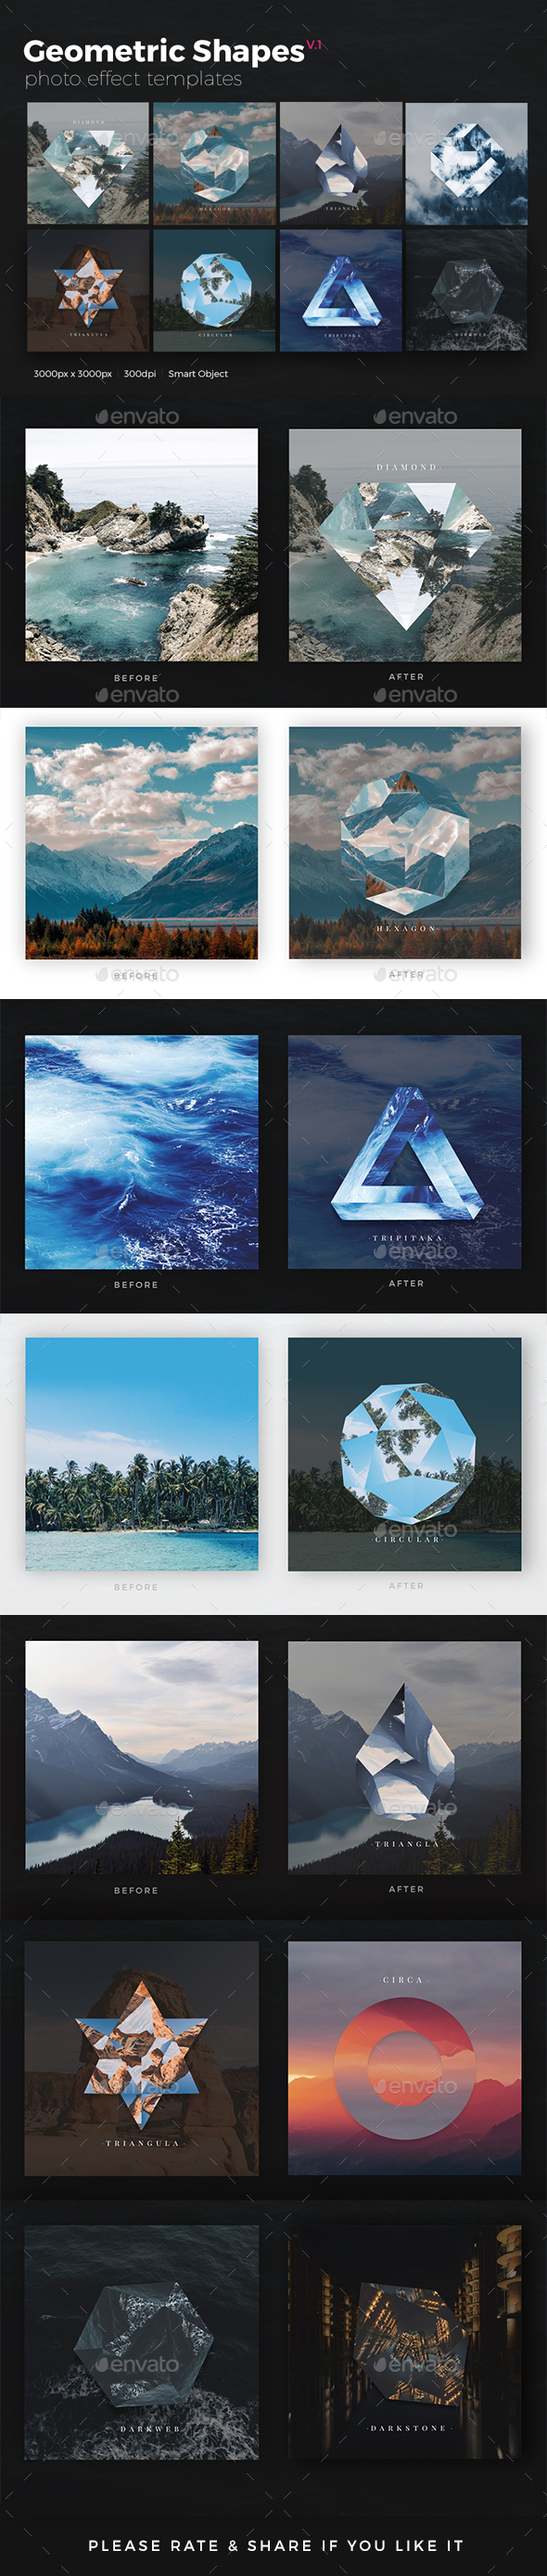 Geometric Shapes Photo Templates v1 - Photo Templates Graphics